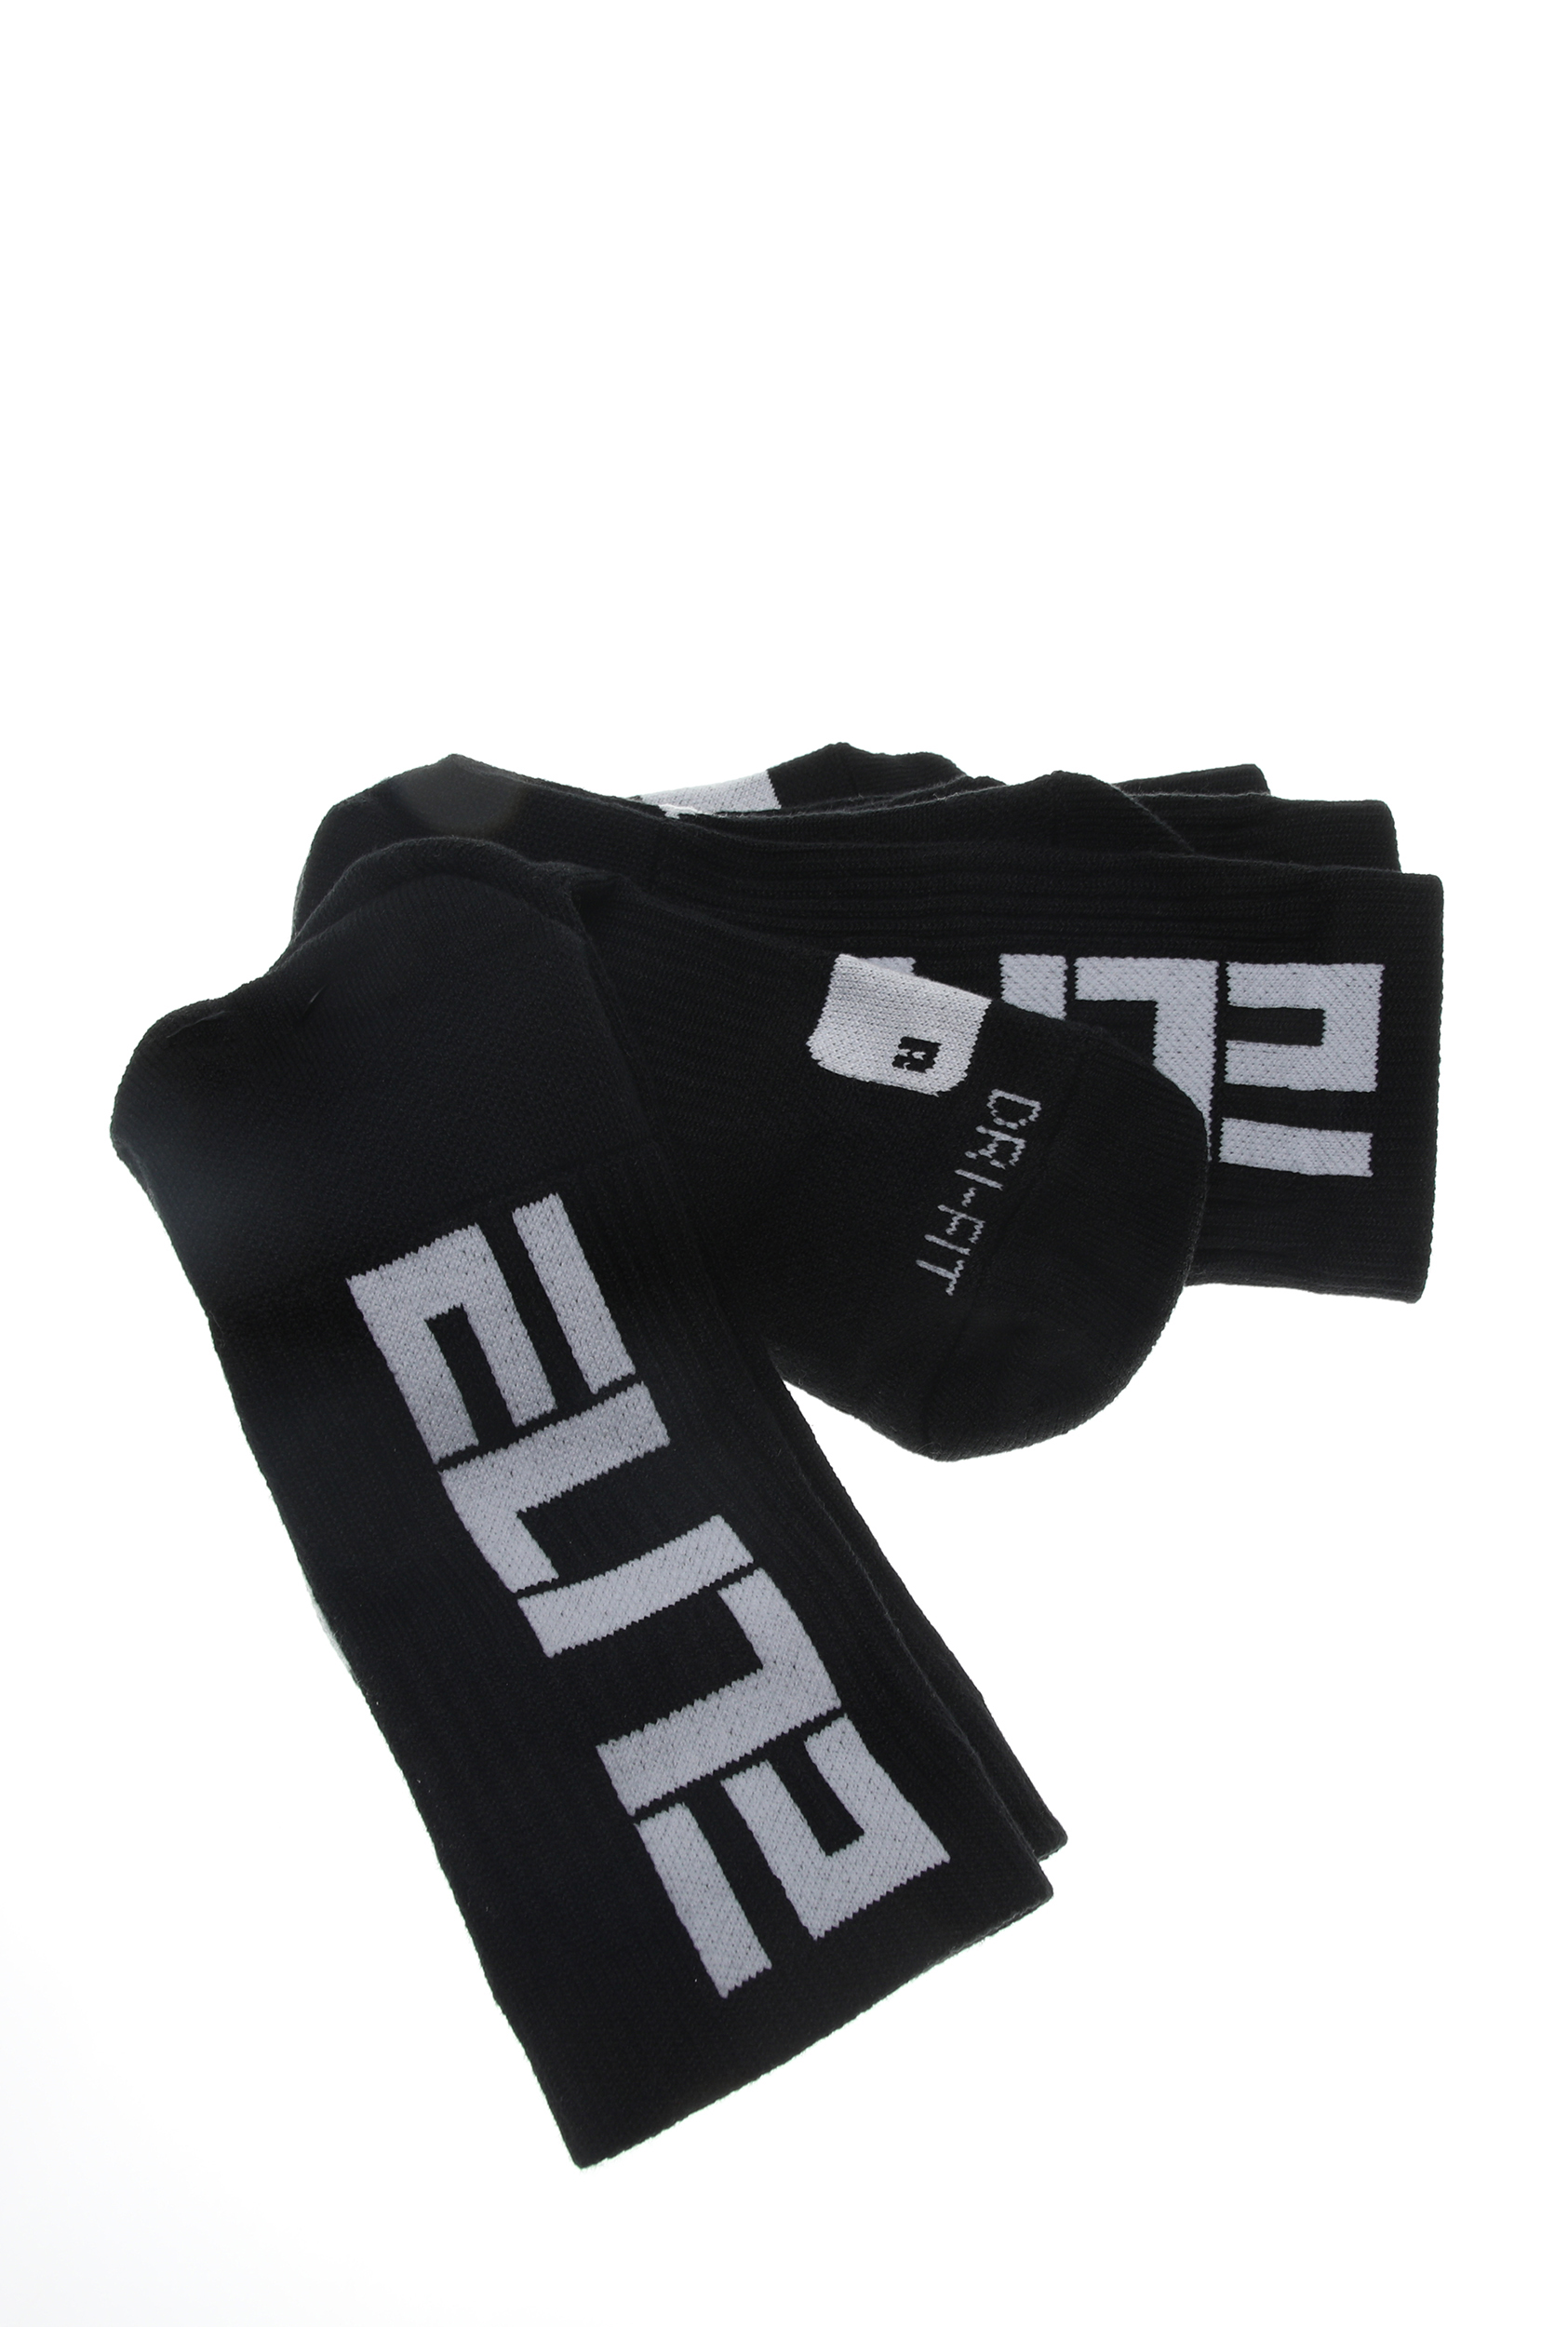 NIKE - Unisex κάλτσες σετ των 3 NIKE ELITE CREW μαύρες